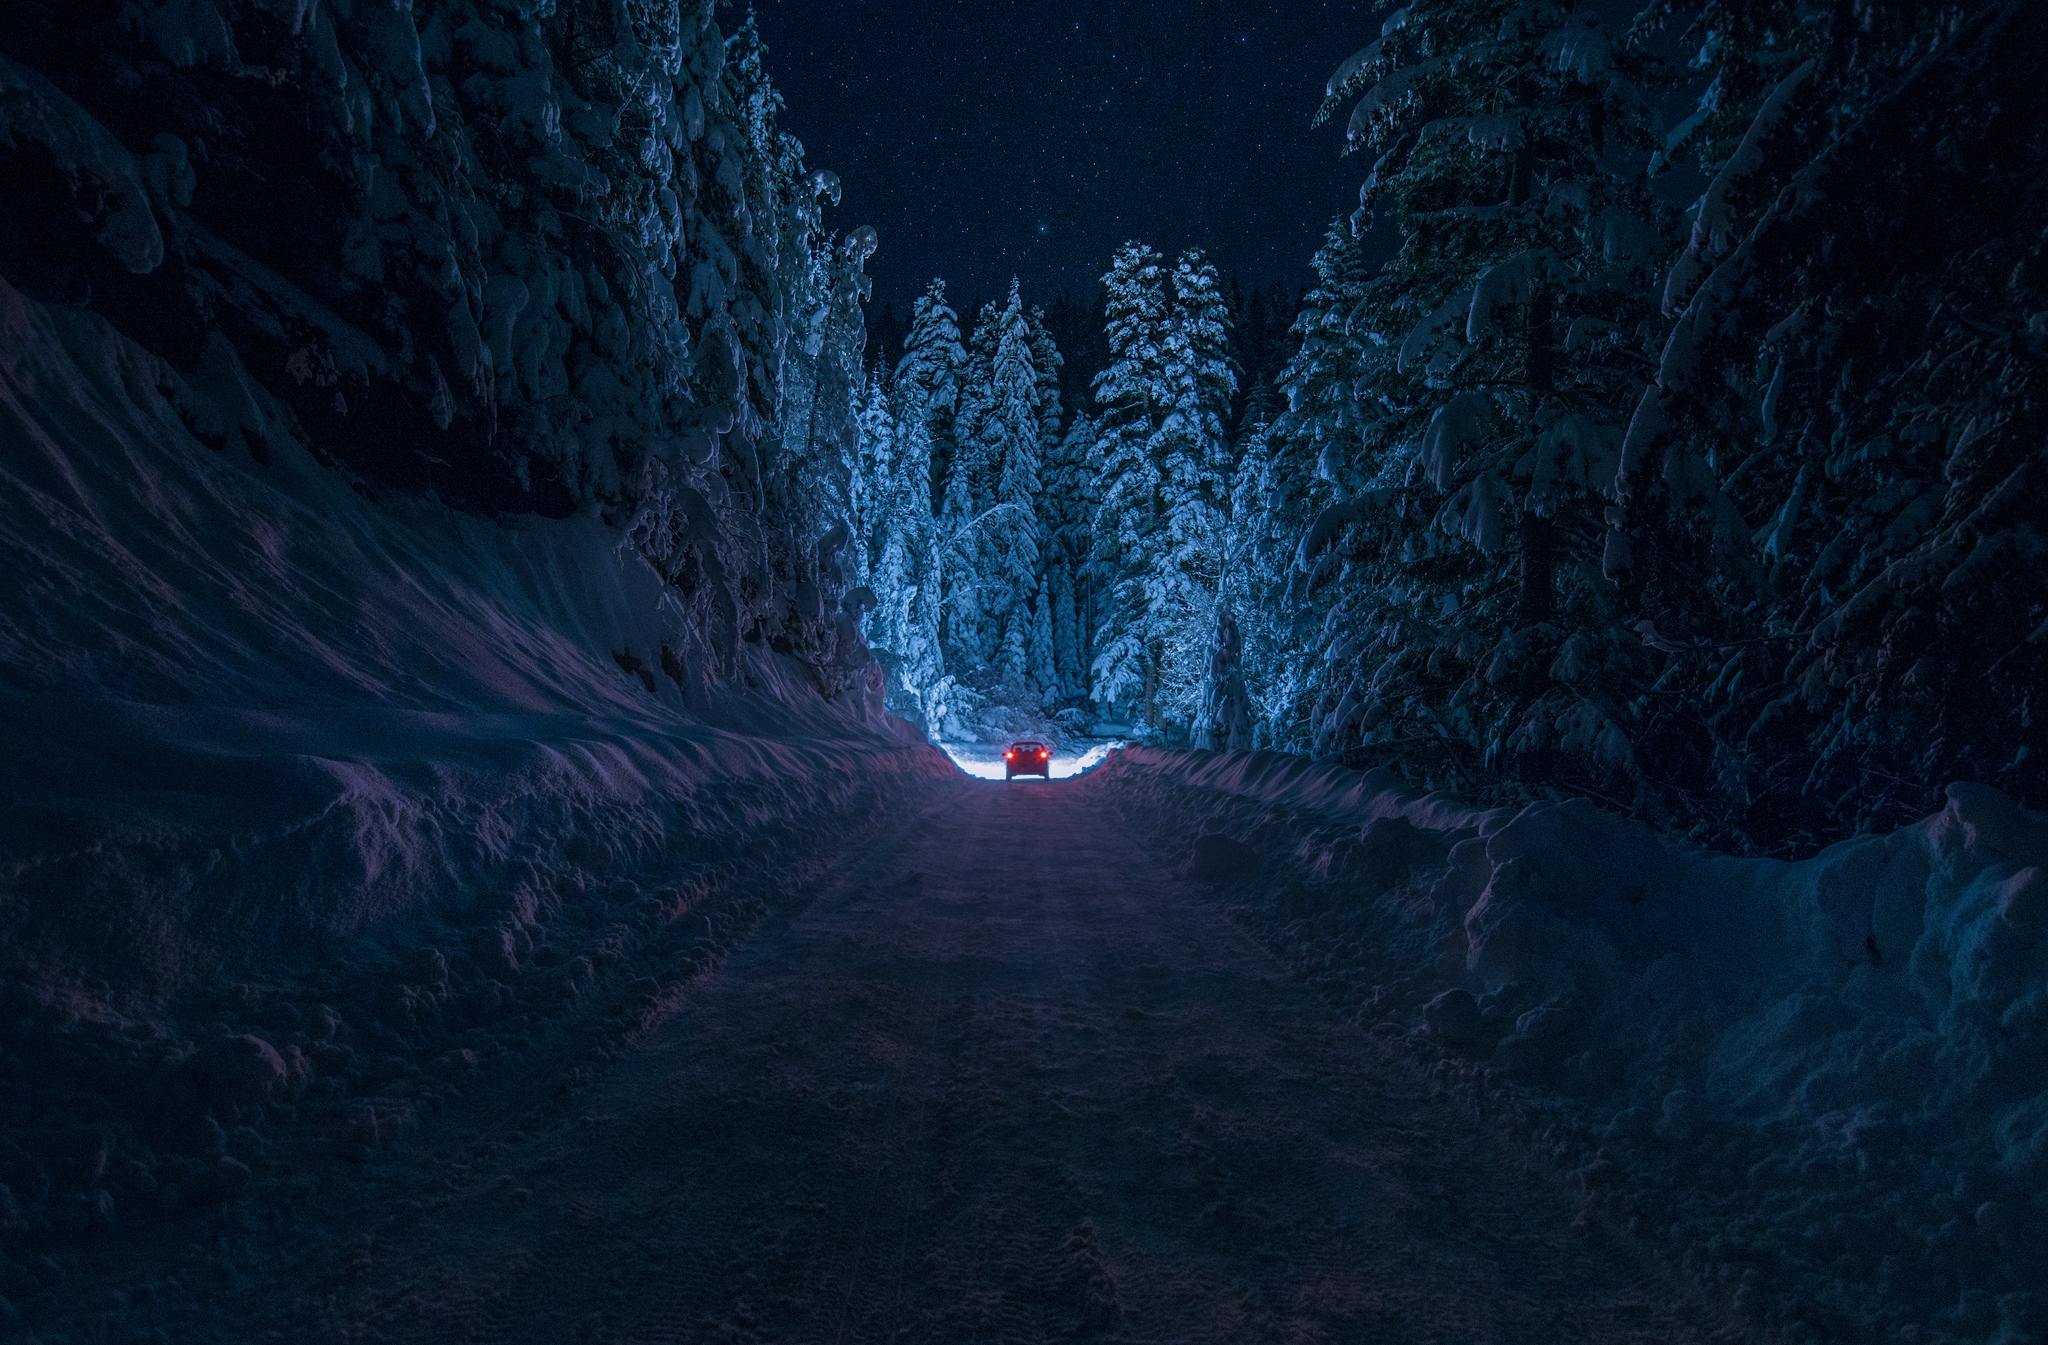 дорога зима вечер снег  № 3902516 без смс